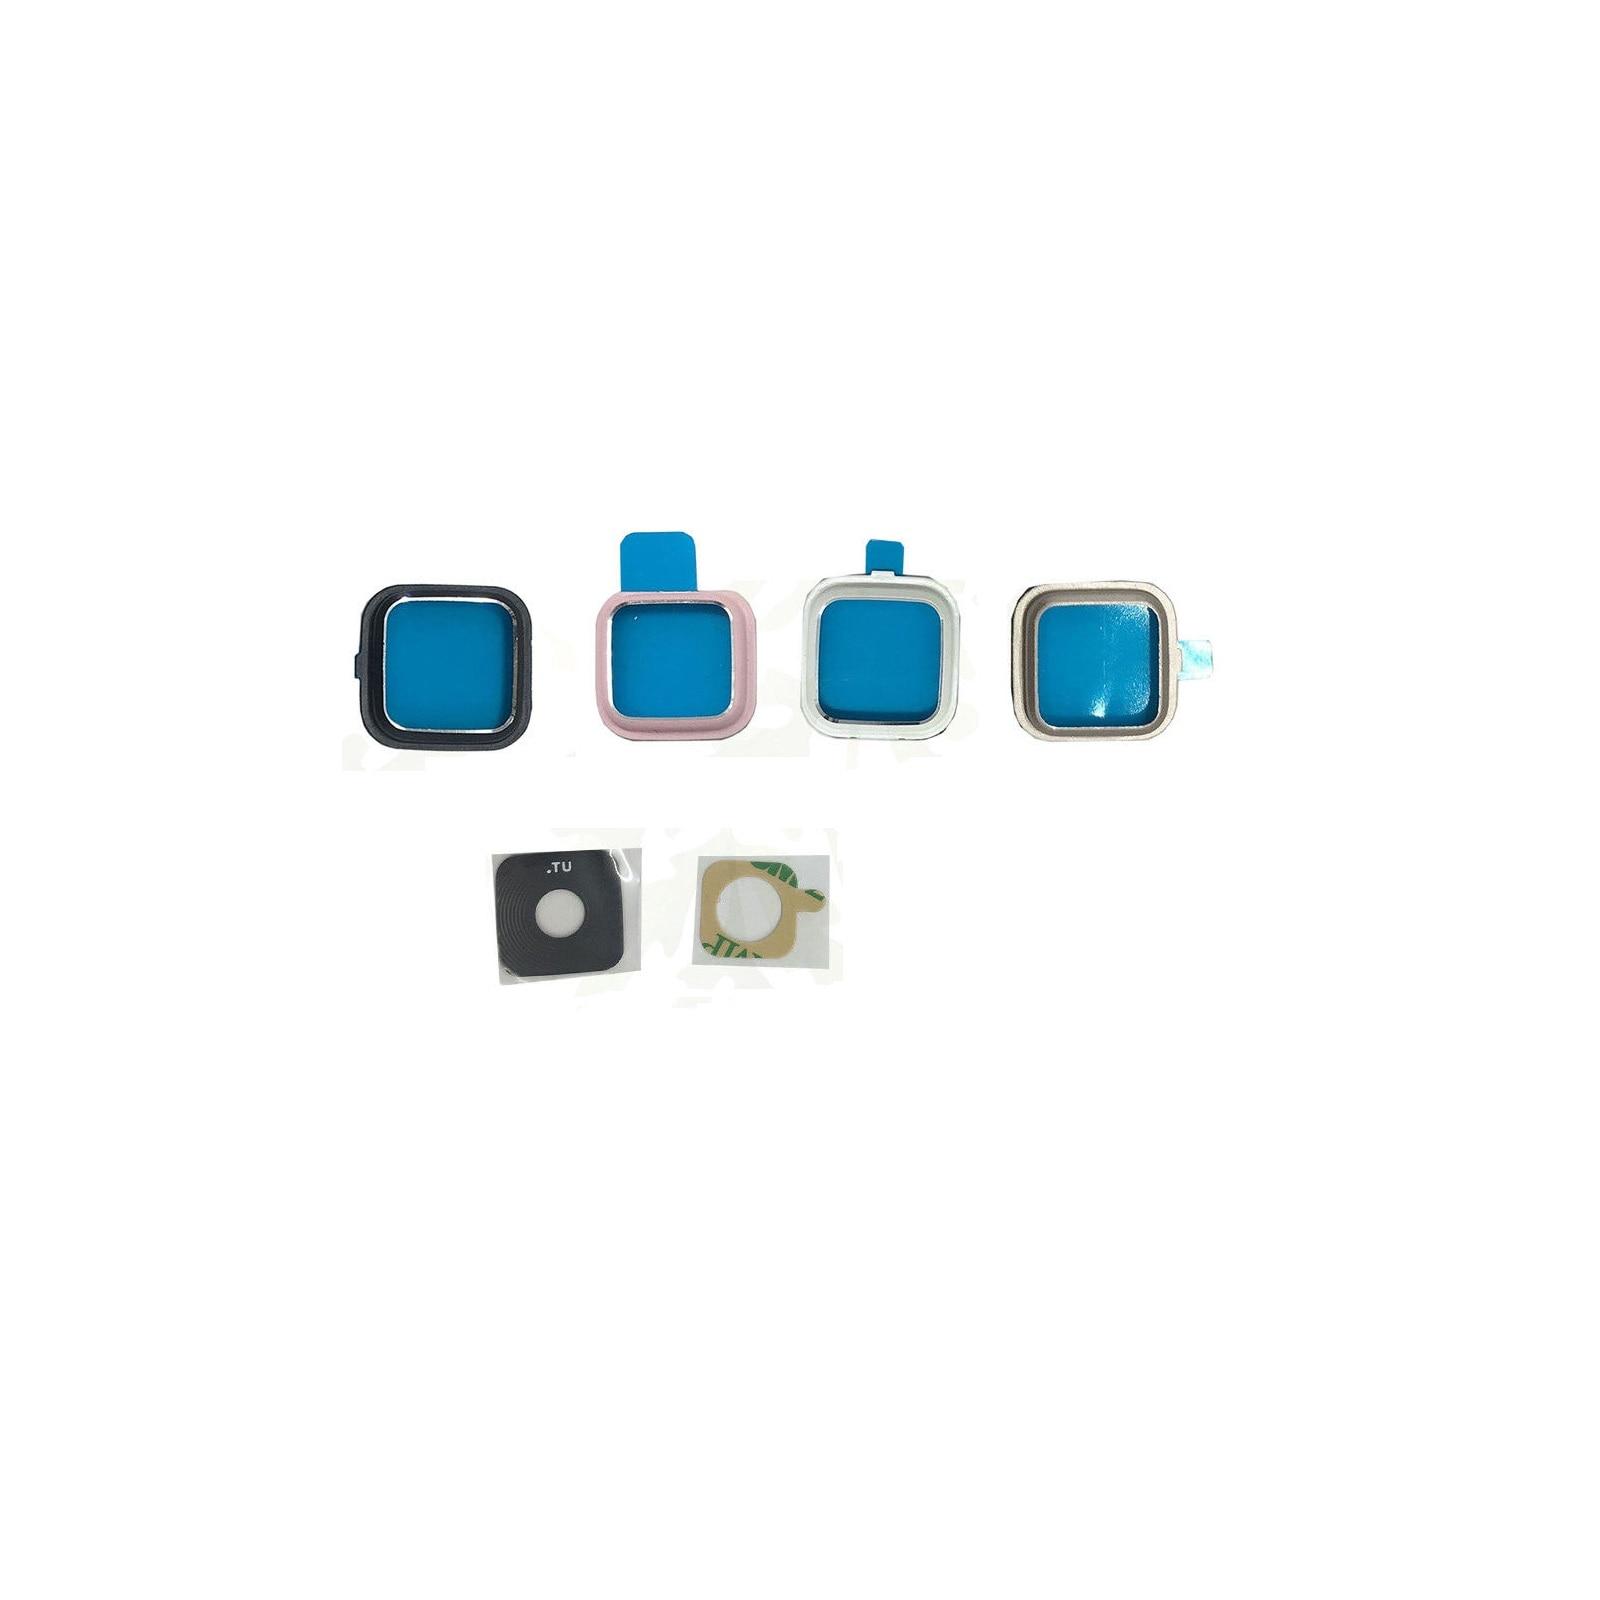 Para Samsung Galaxy Note 4 SM-N910 cámara trasera anillo lente cubierta módulo negro blanco rosa oro 10 unids/lote